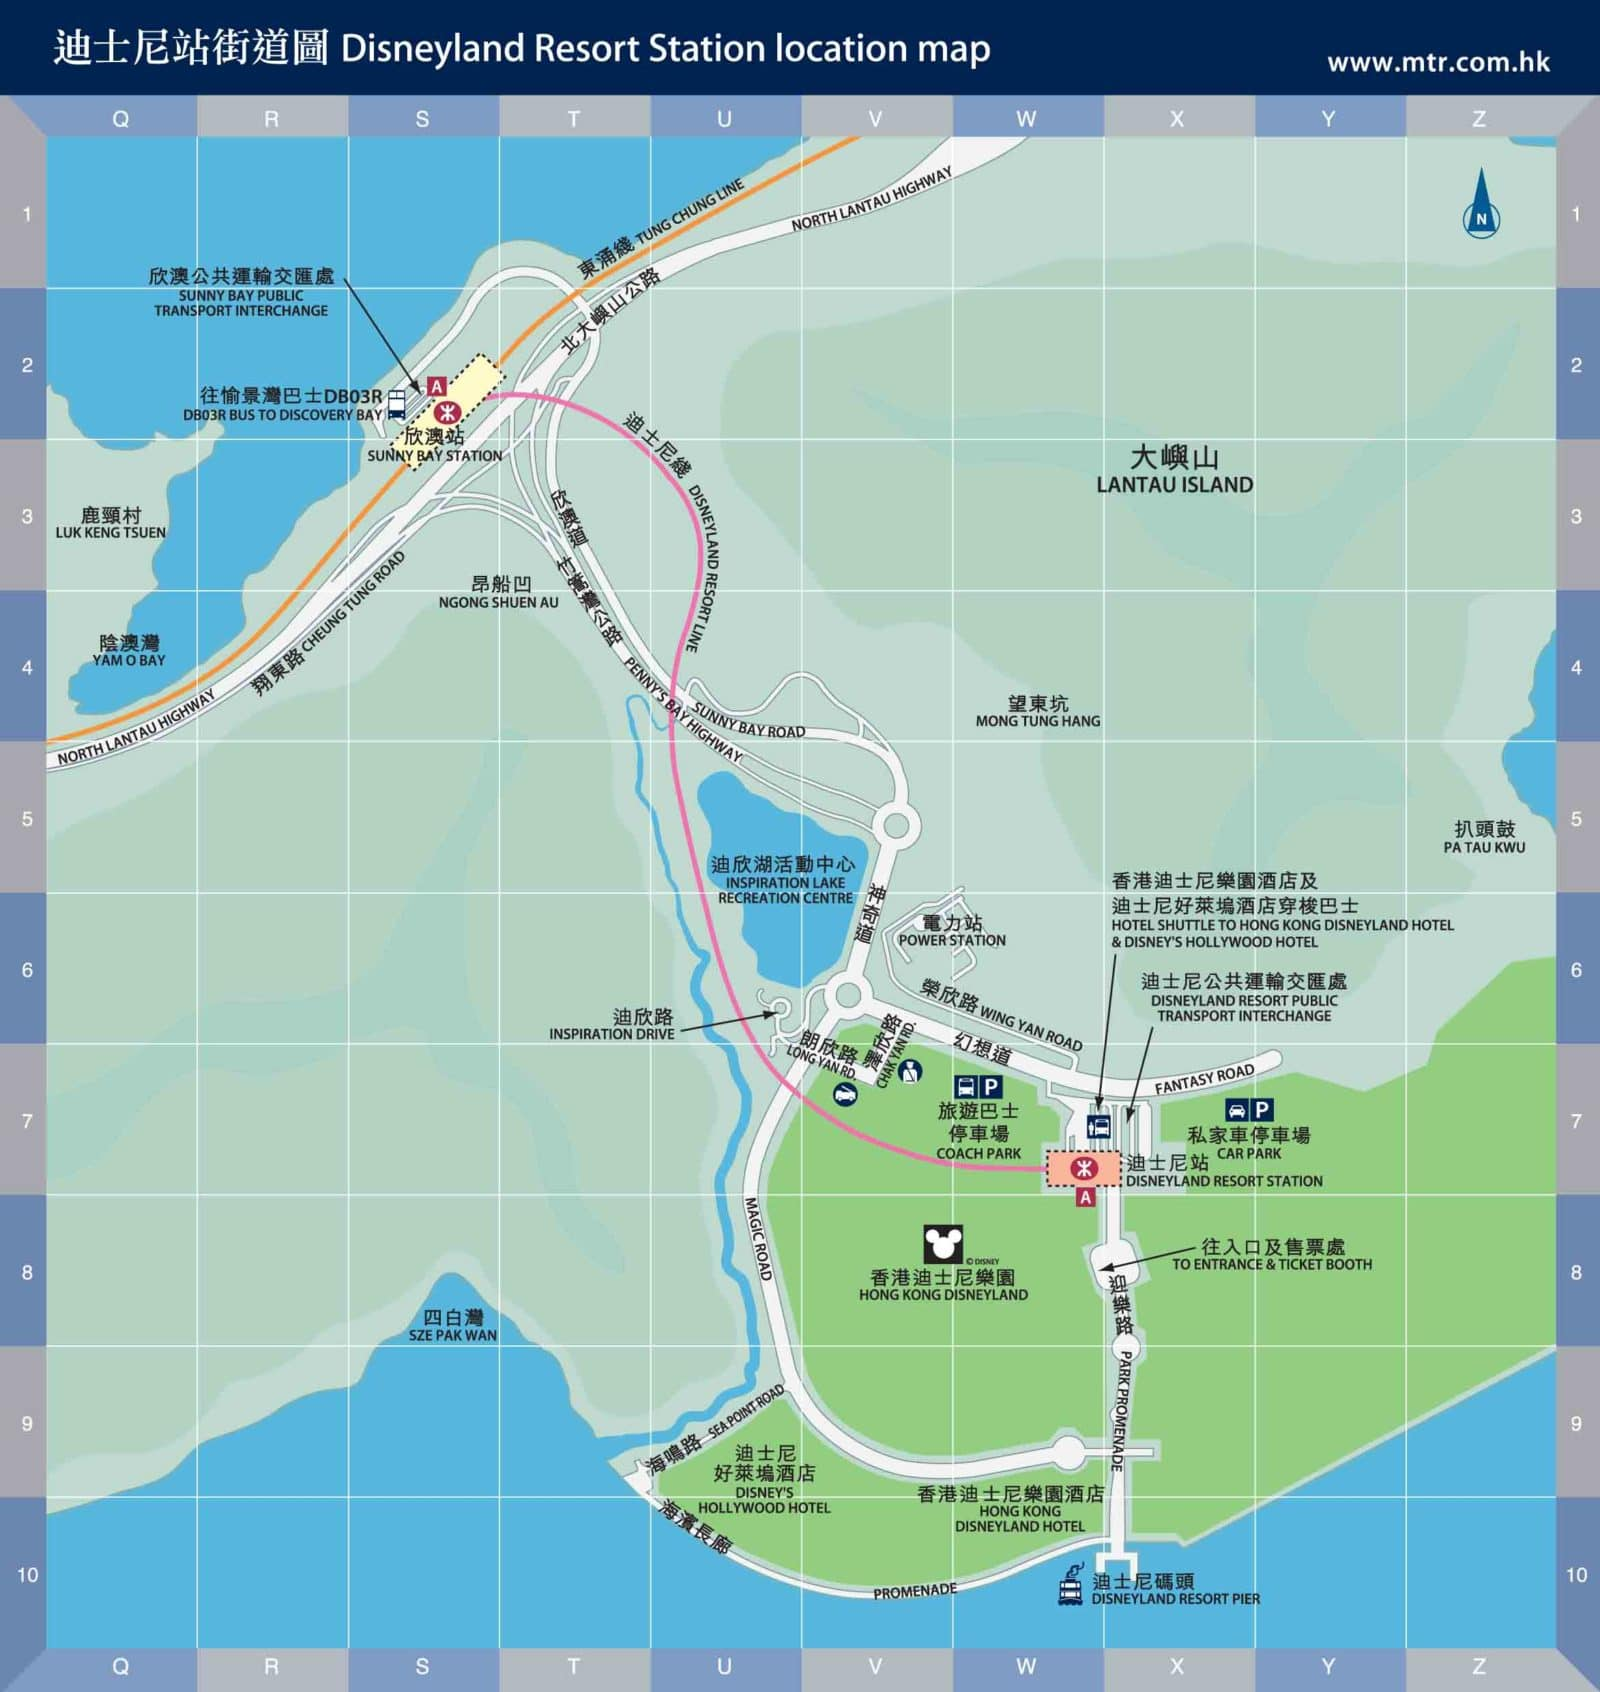 Printable Disneyland Map 2013 Lantau island: disneyland mtr